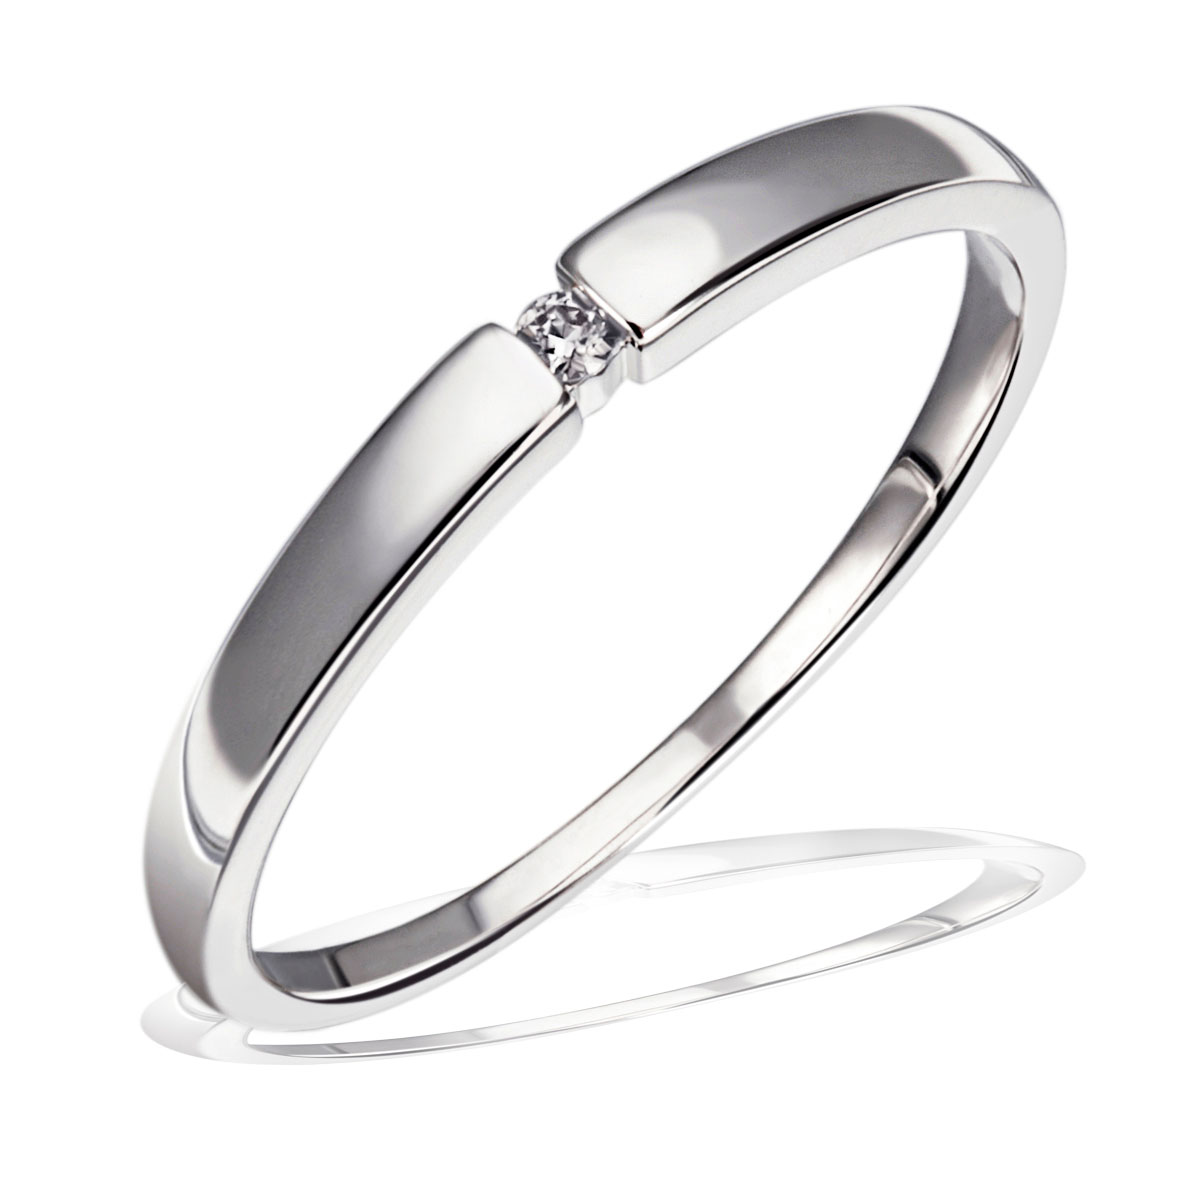 Goldmaid-Ring-Solitaer-Weissgold-Gelbgold-oder-Rotgold-1-Brillant-0-03-ct-NEU